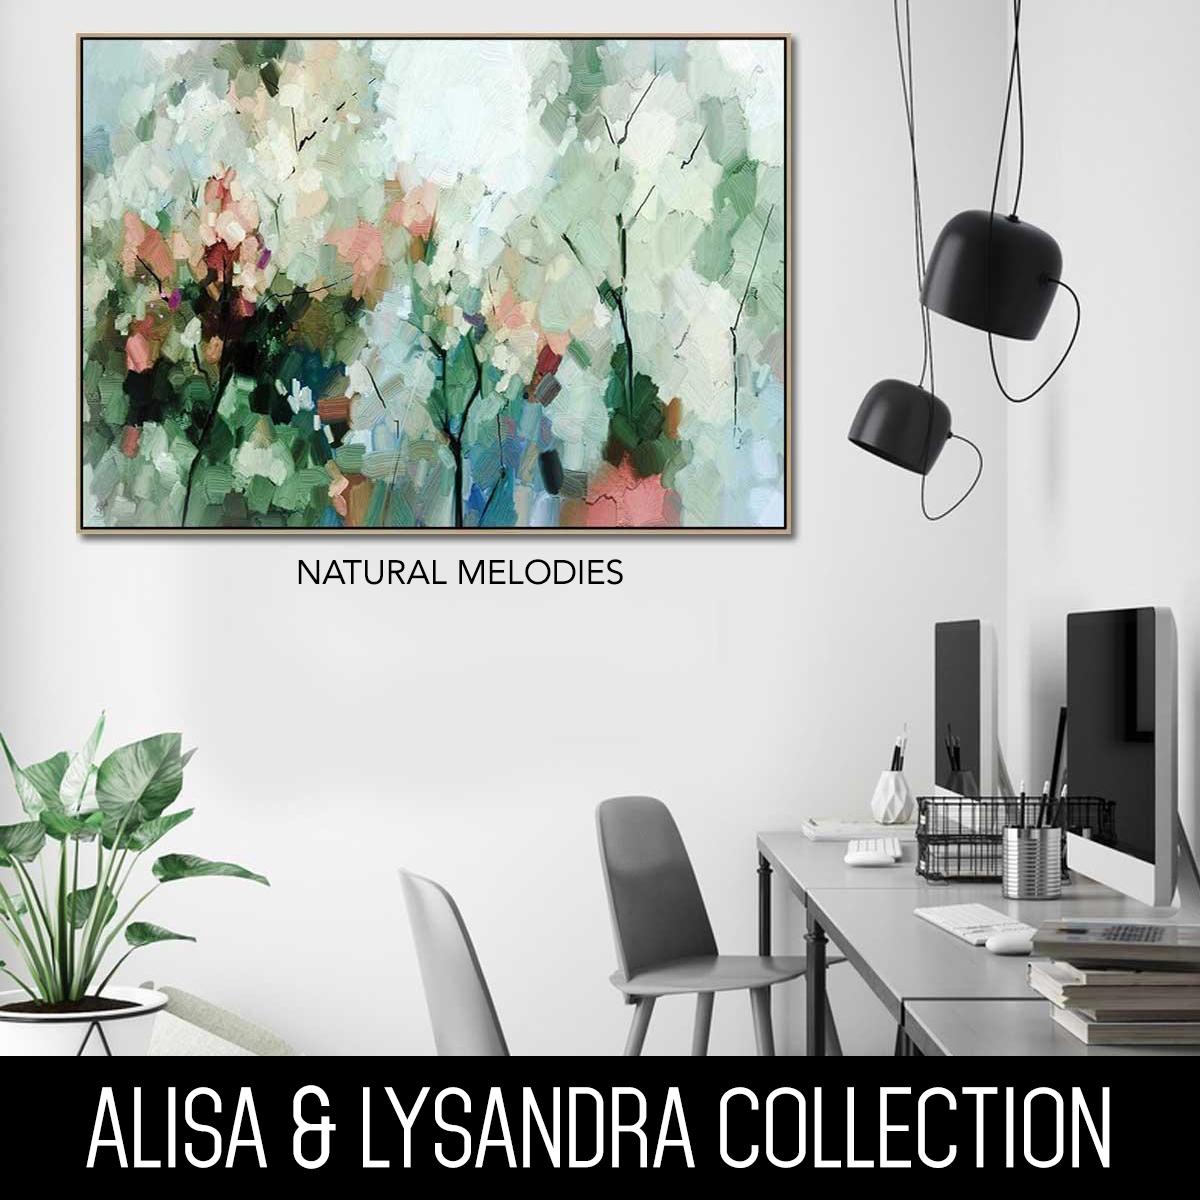 ALISA & LYSANDRA COLLECTION